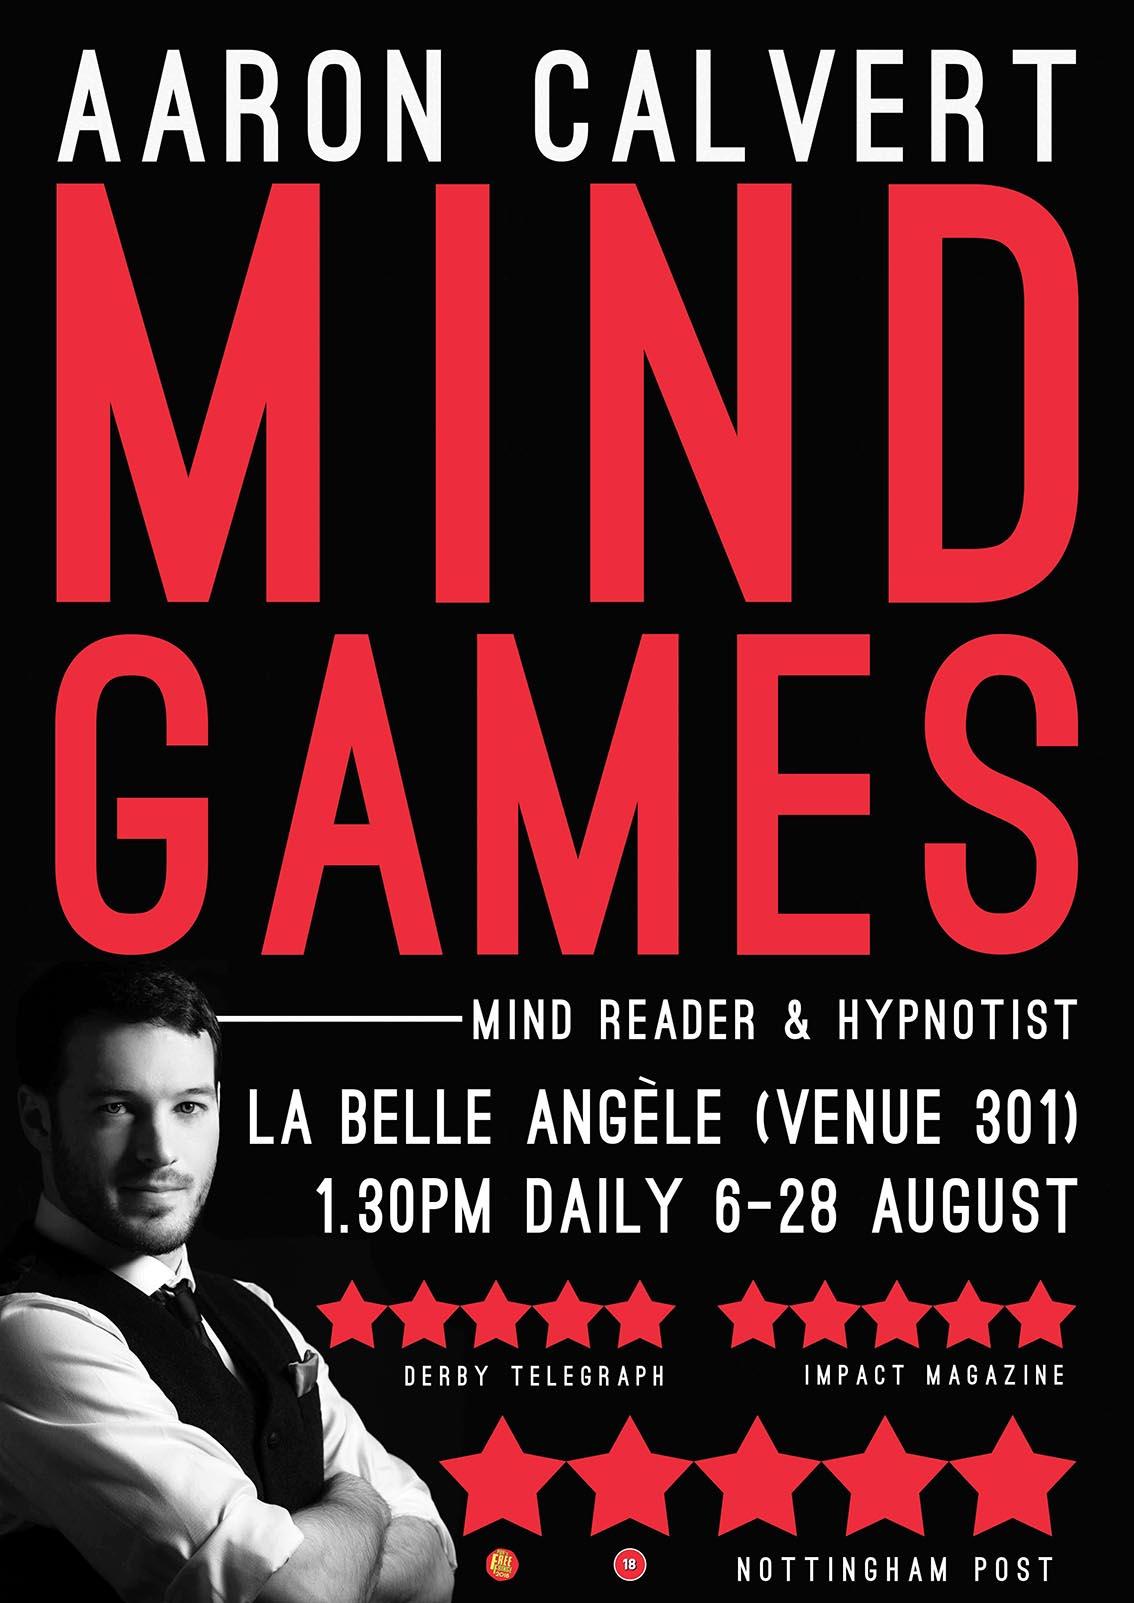 Aaron Calvert MIND GAMES Edinburgh Fringe poster edfringe